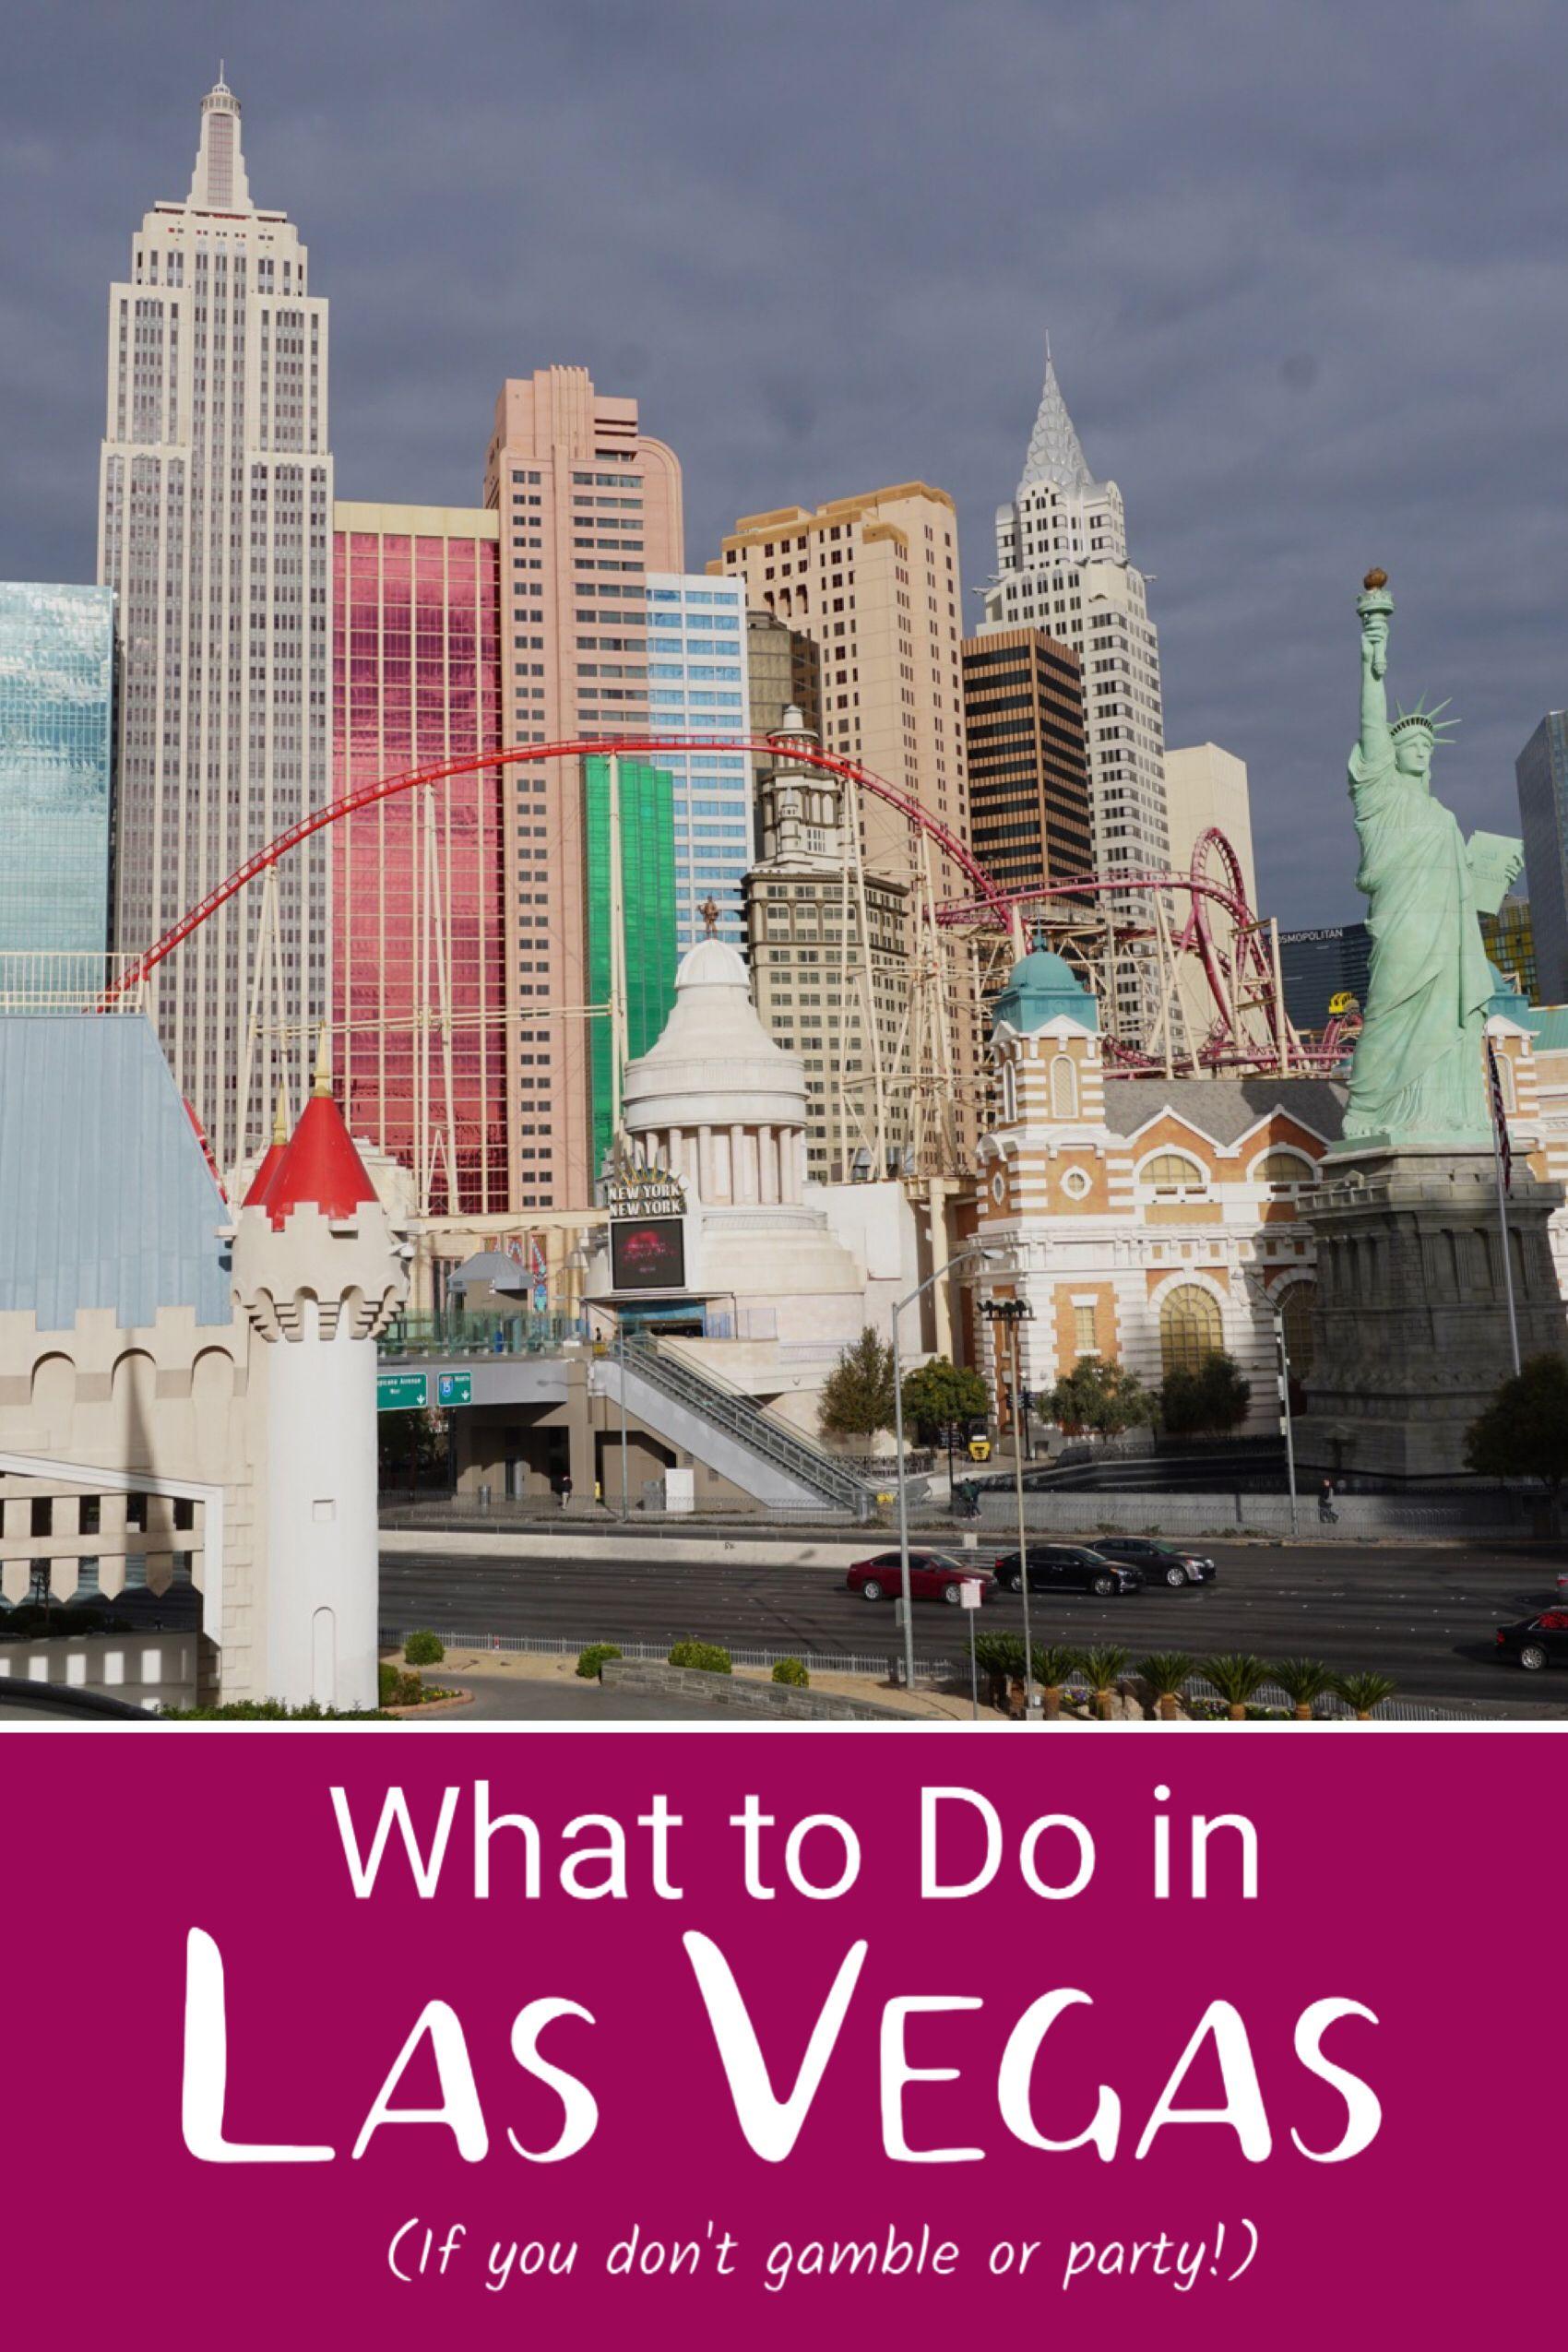 25 Best Things To Do In Las Vegas (That Aren't Gambling